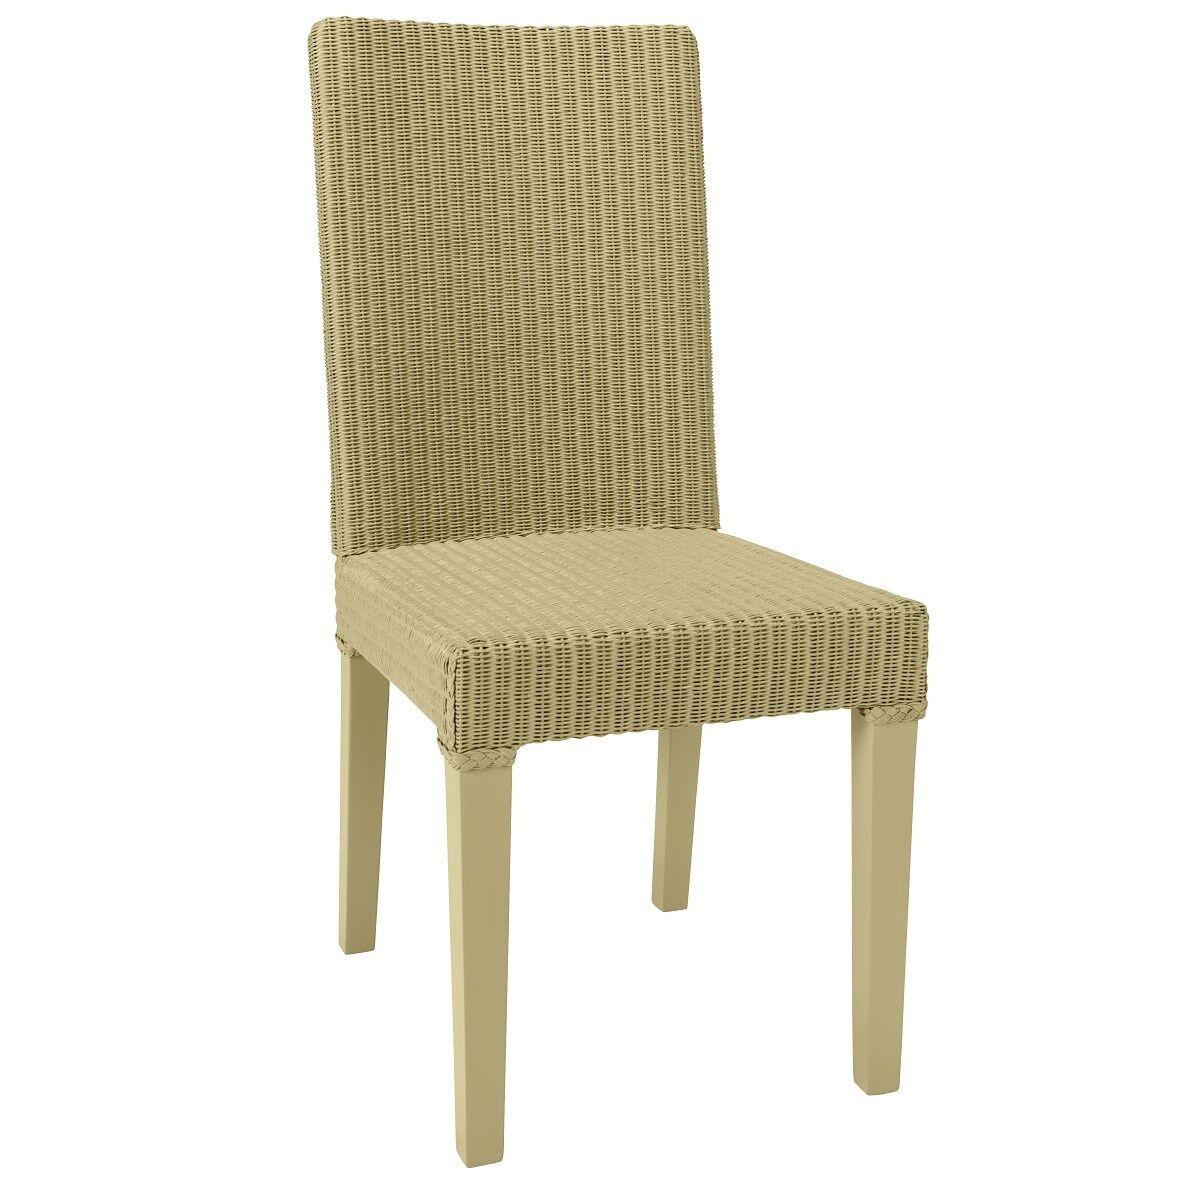 Kok Maison Chaise en Lloyd Loom jaune paille